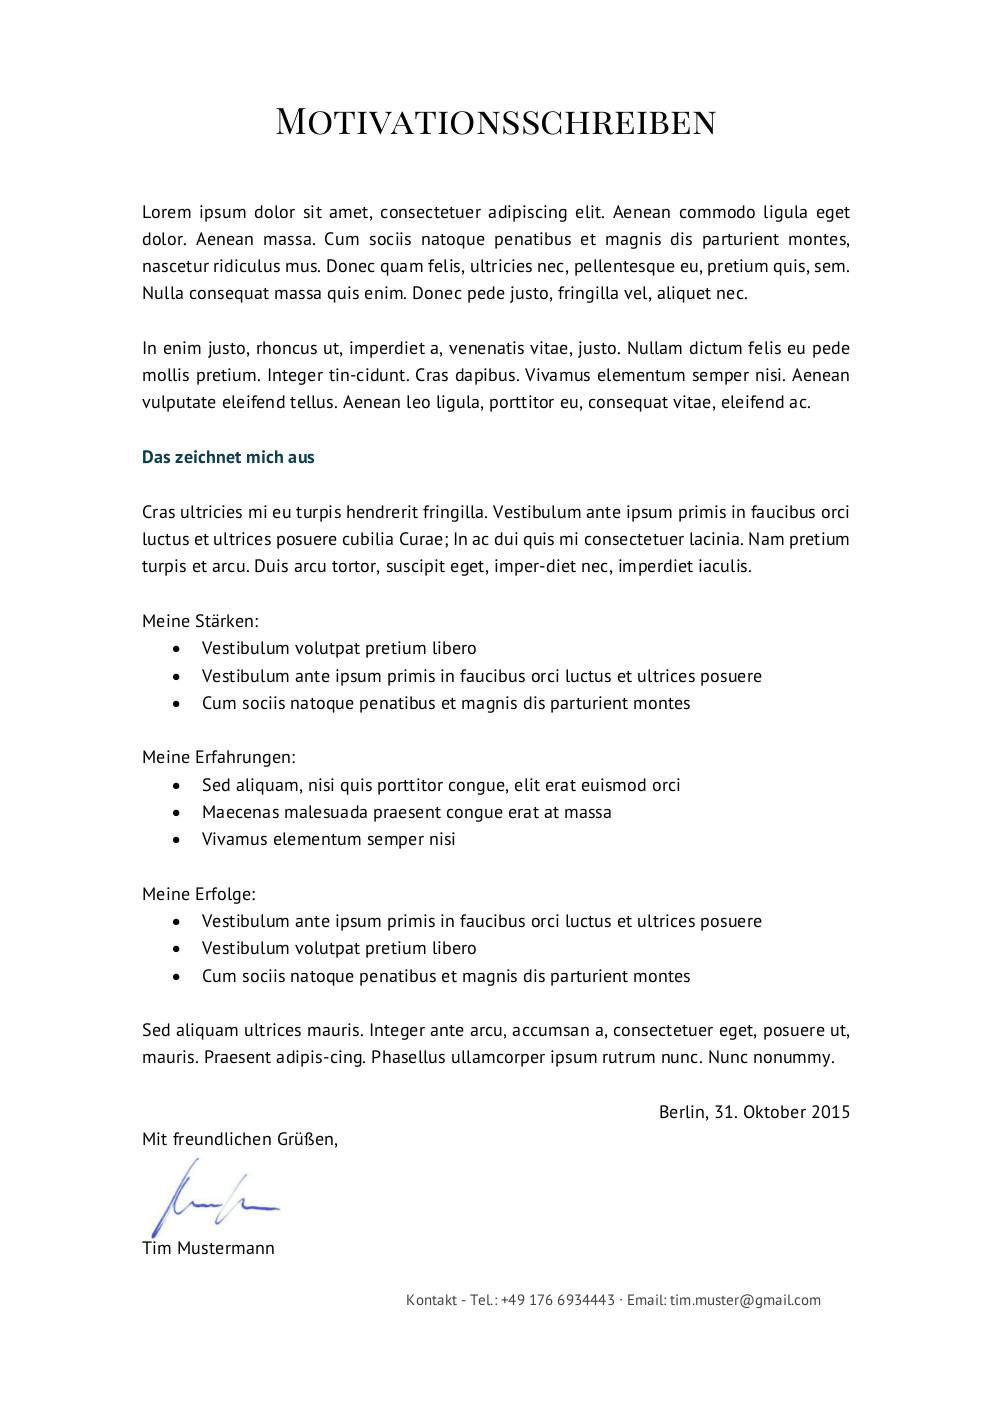 Bewerbungsmuster Finanzberater | Lebenslauf Designs